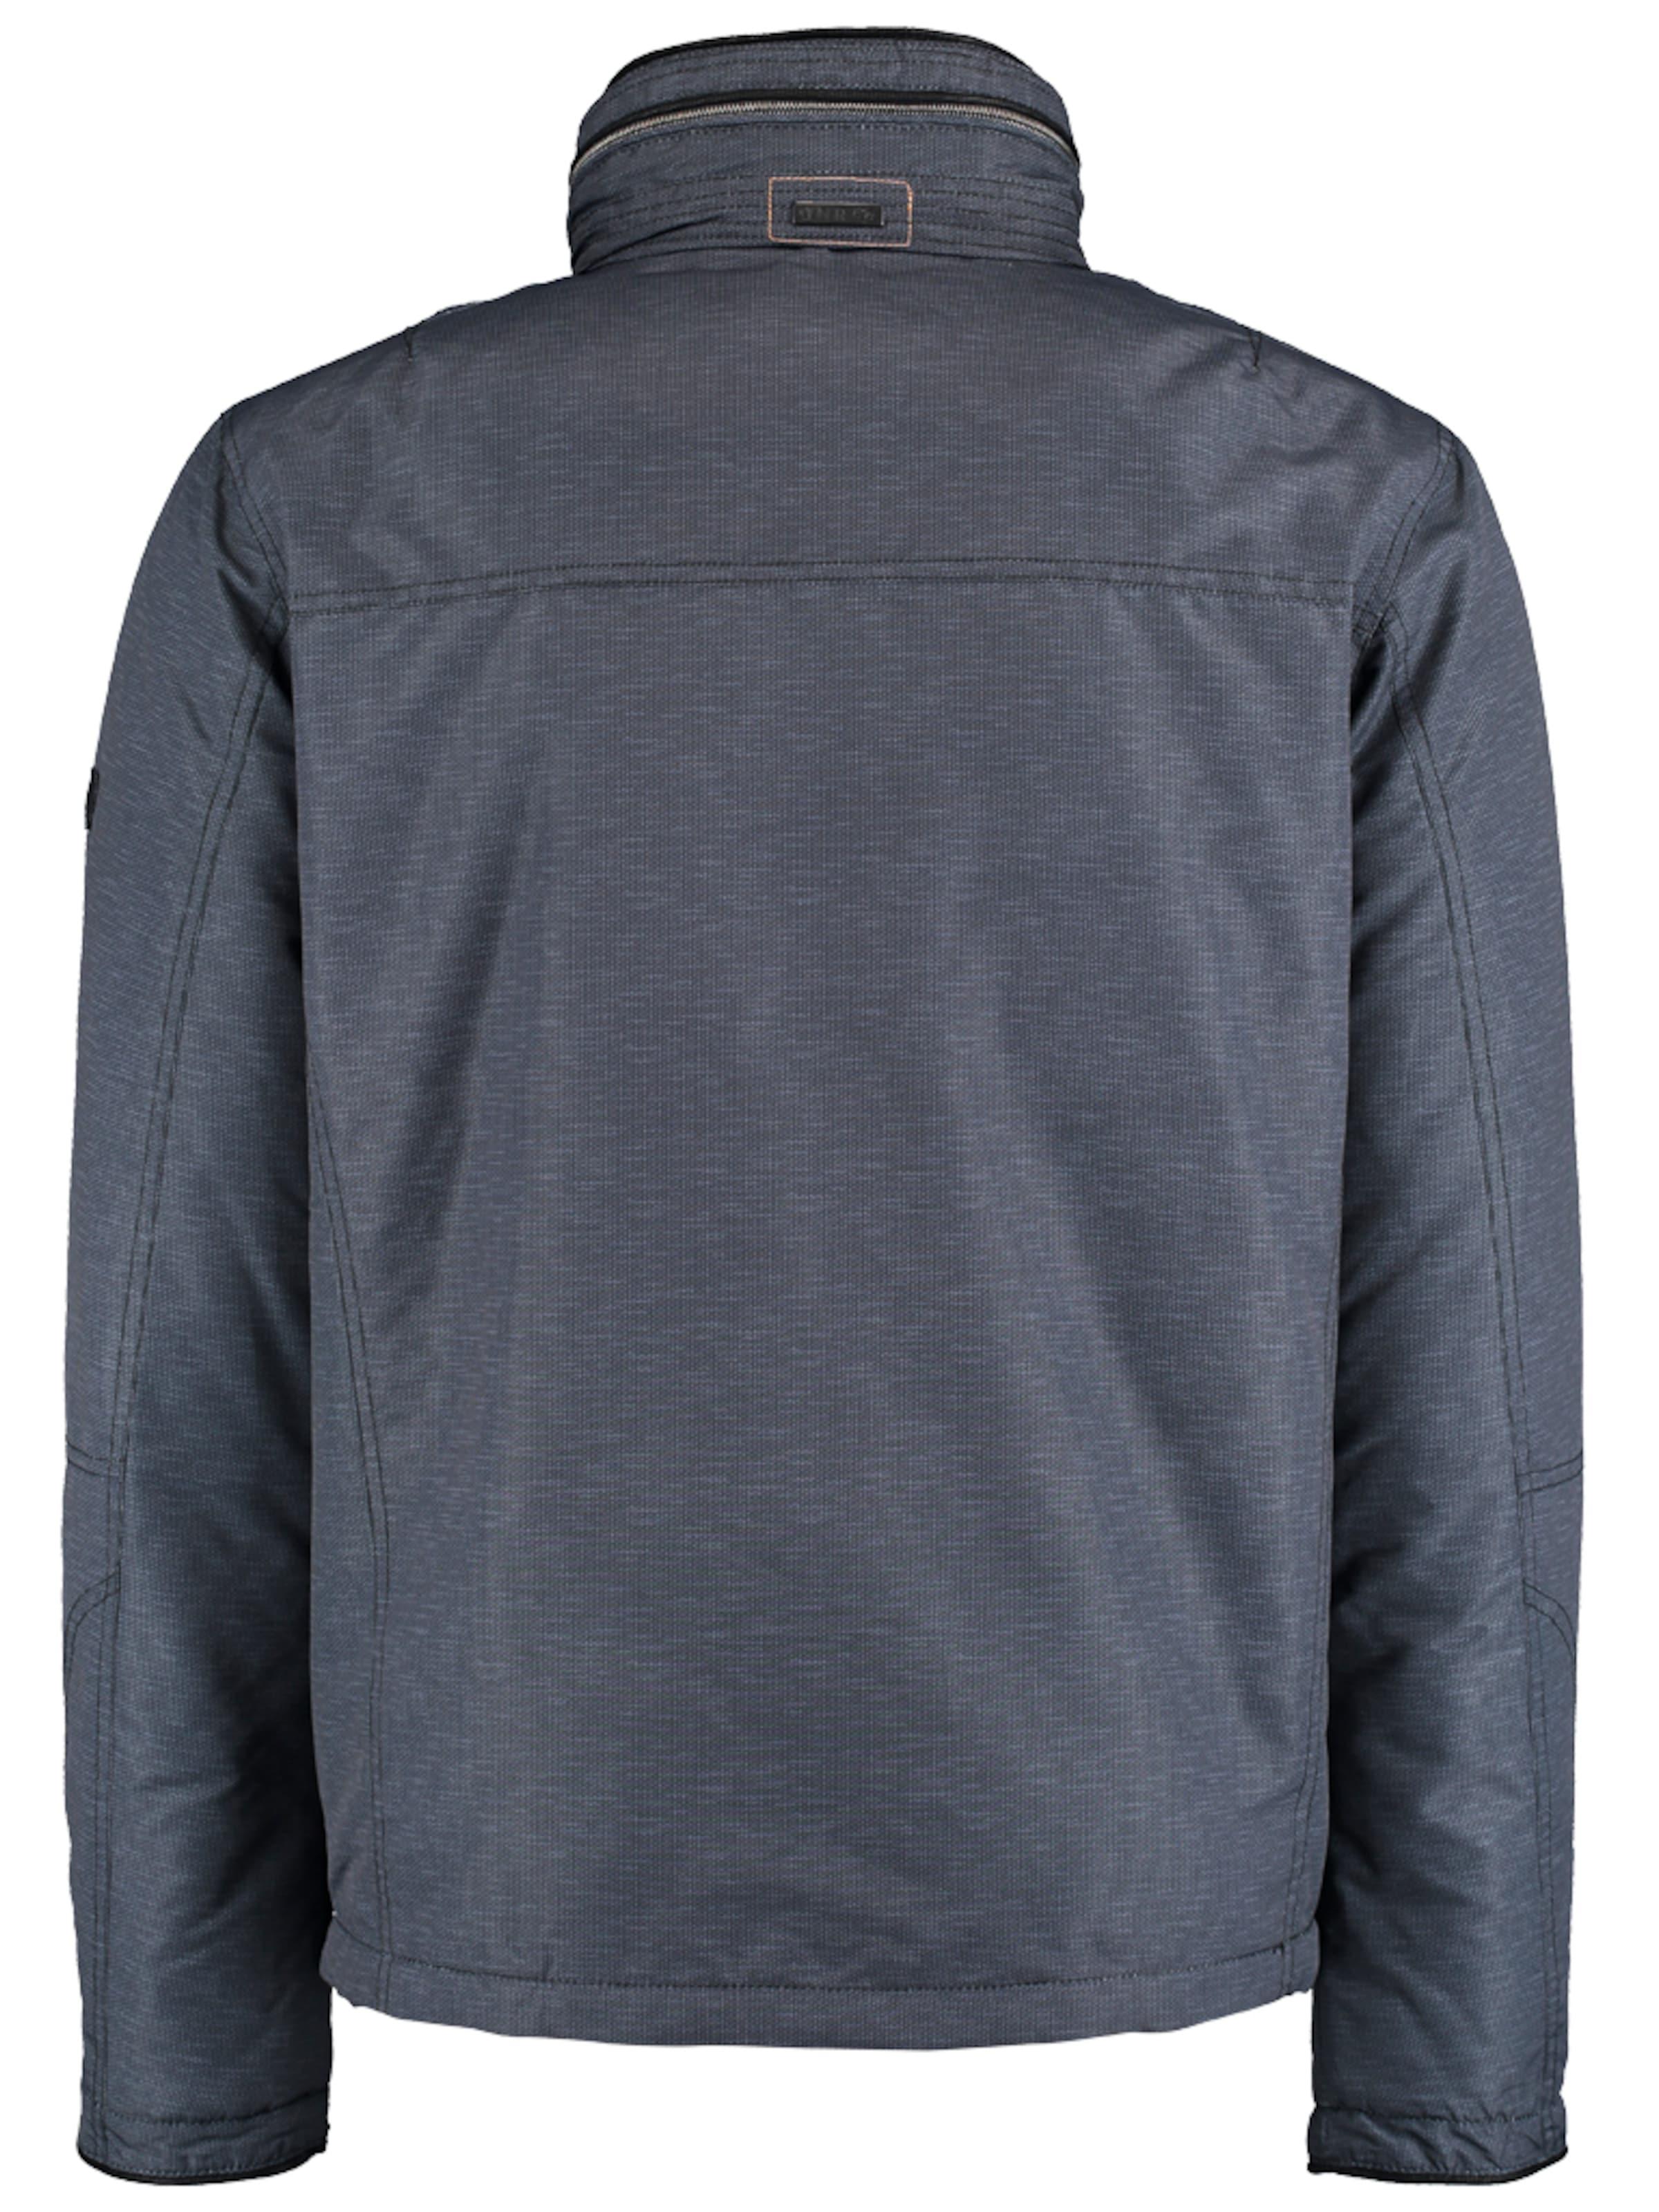 DNR Jackets Jacke in grau Synthetik 8719355341011